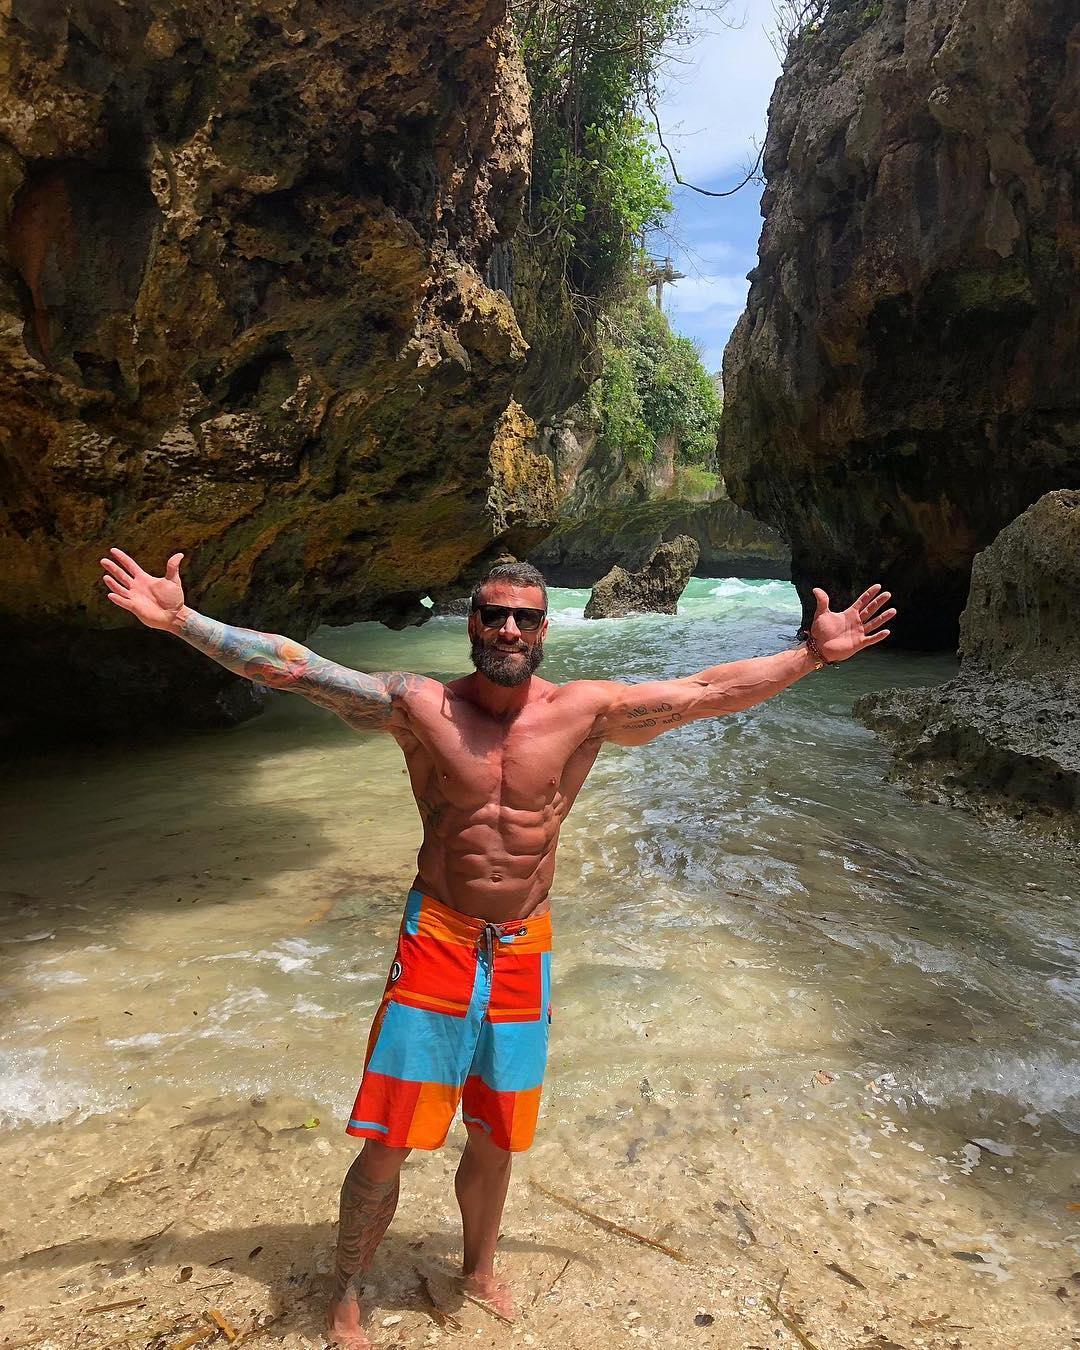 sexy-fit-muscular-bearded-daddy-parker-egerton-barechest-beach-sunglasses-hunk